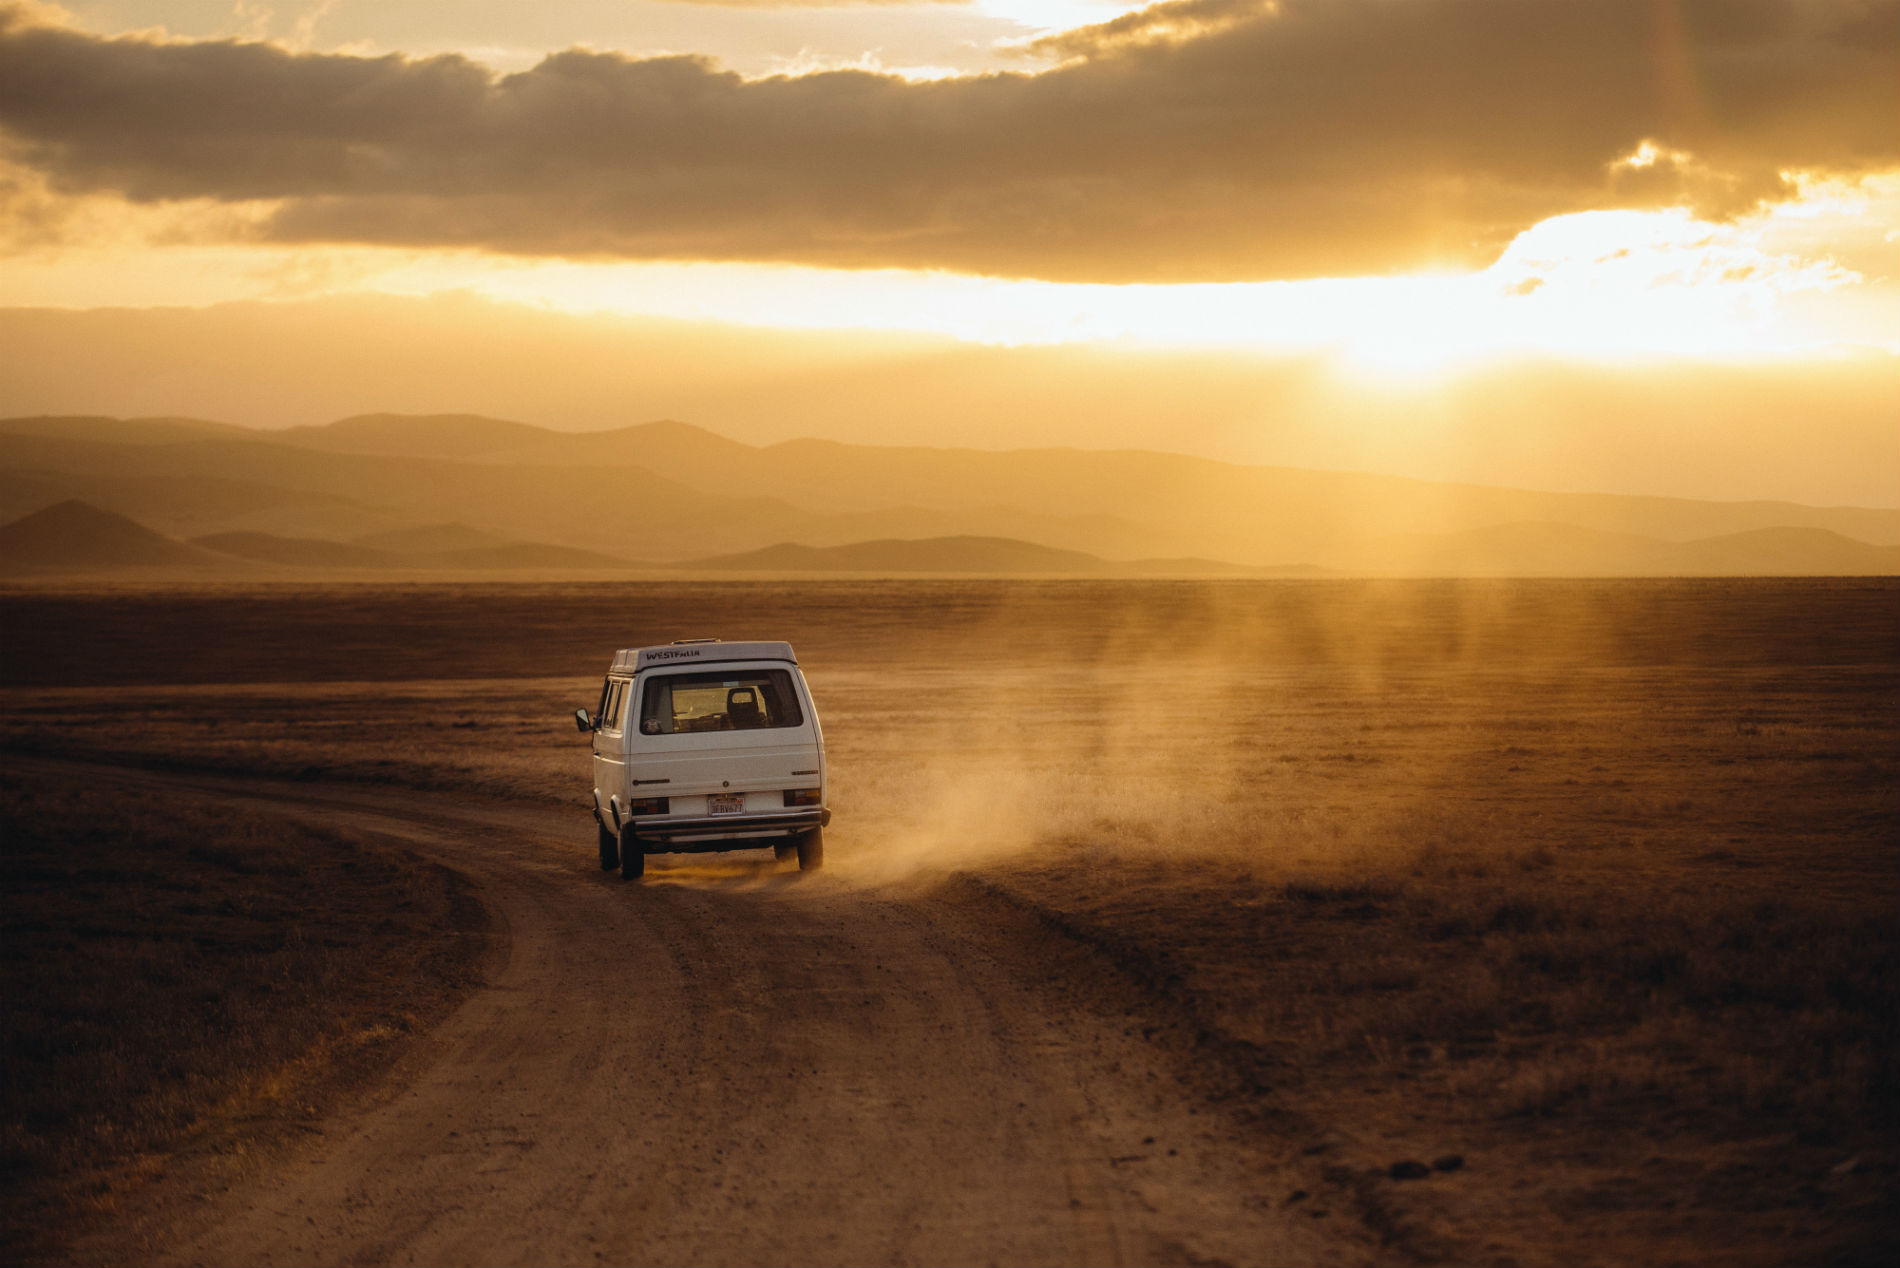 car drives through dusty baron road